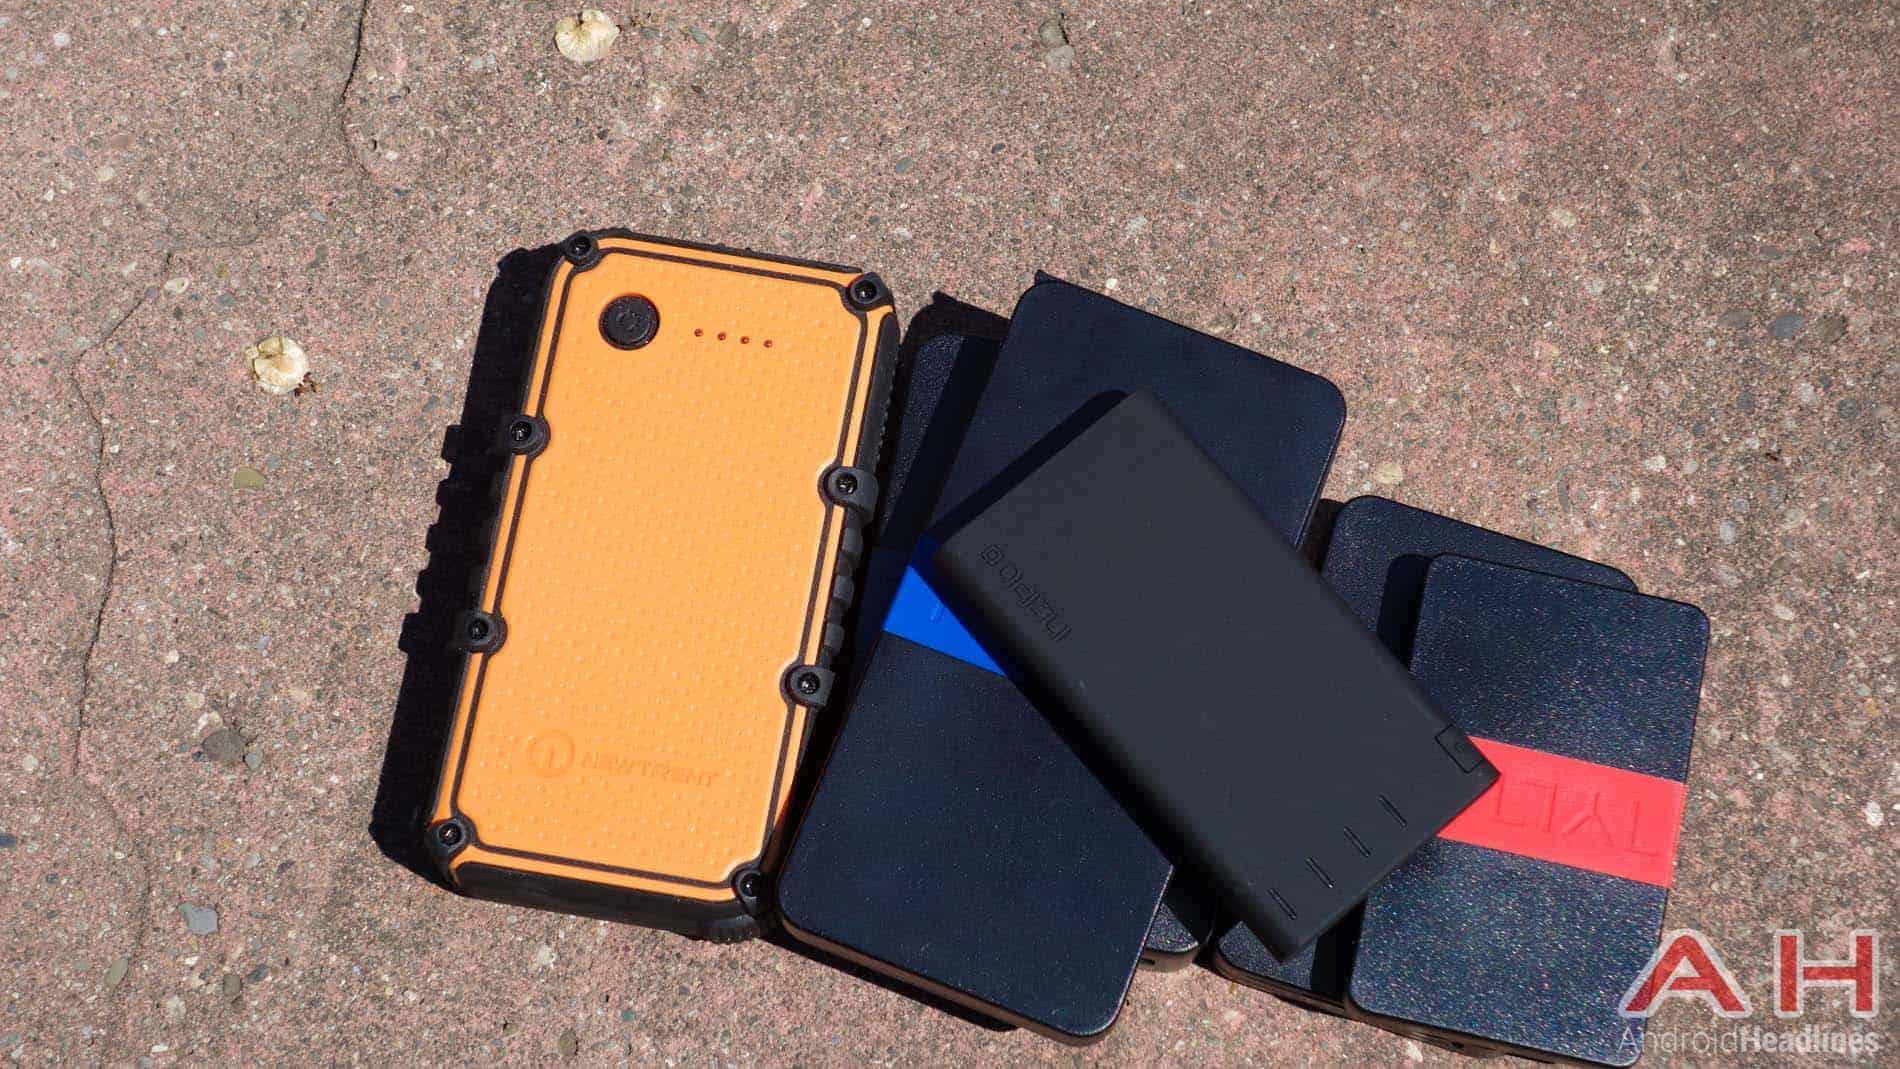 Featured: Top 10 Portable Batteries/Battery Packs – Fall 2014 | Drippler - Apps, Games, News, Updates & Accessories